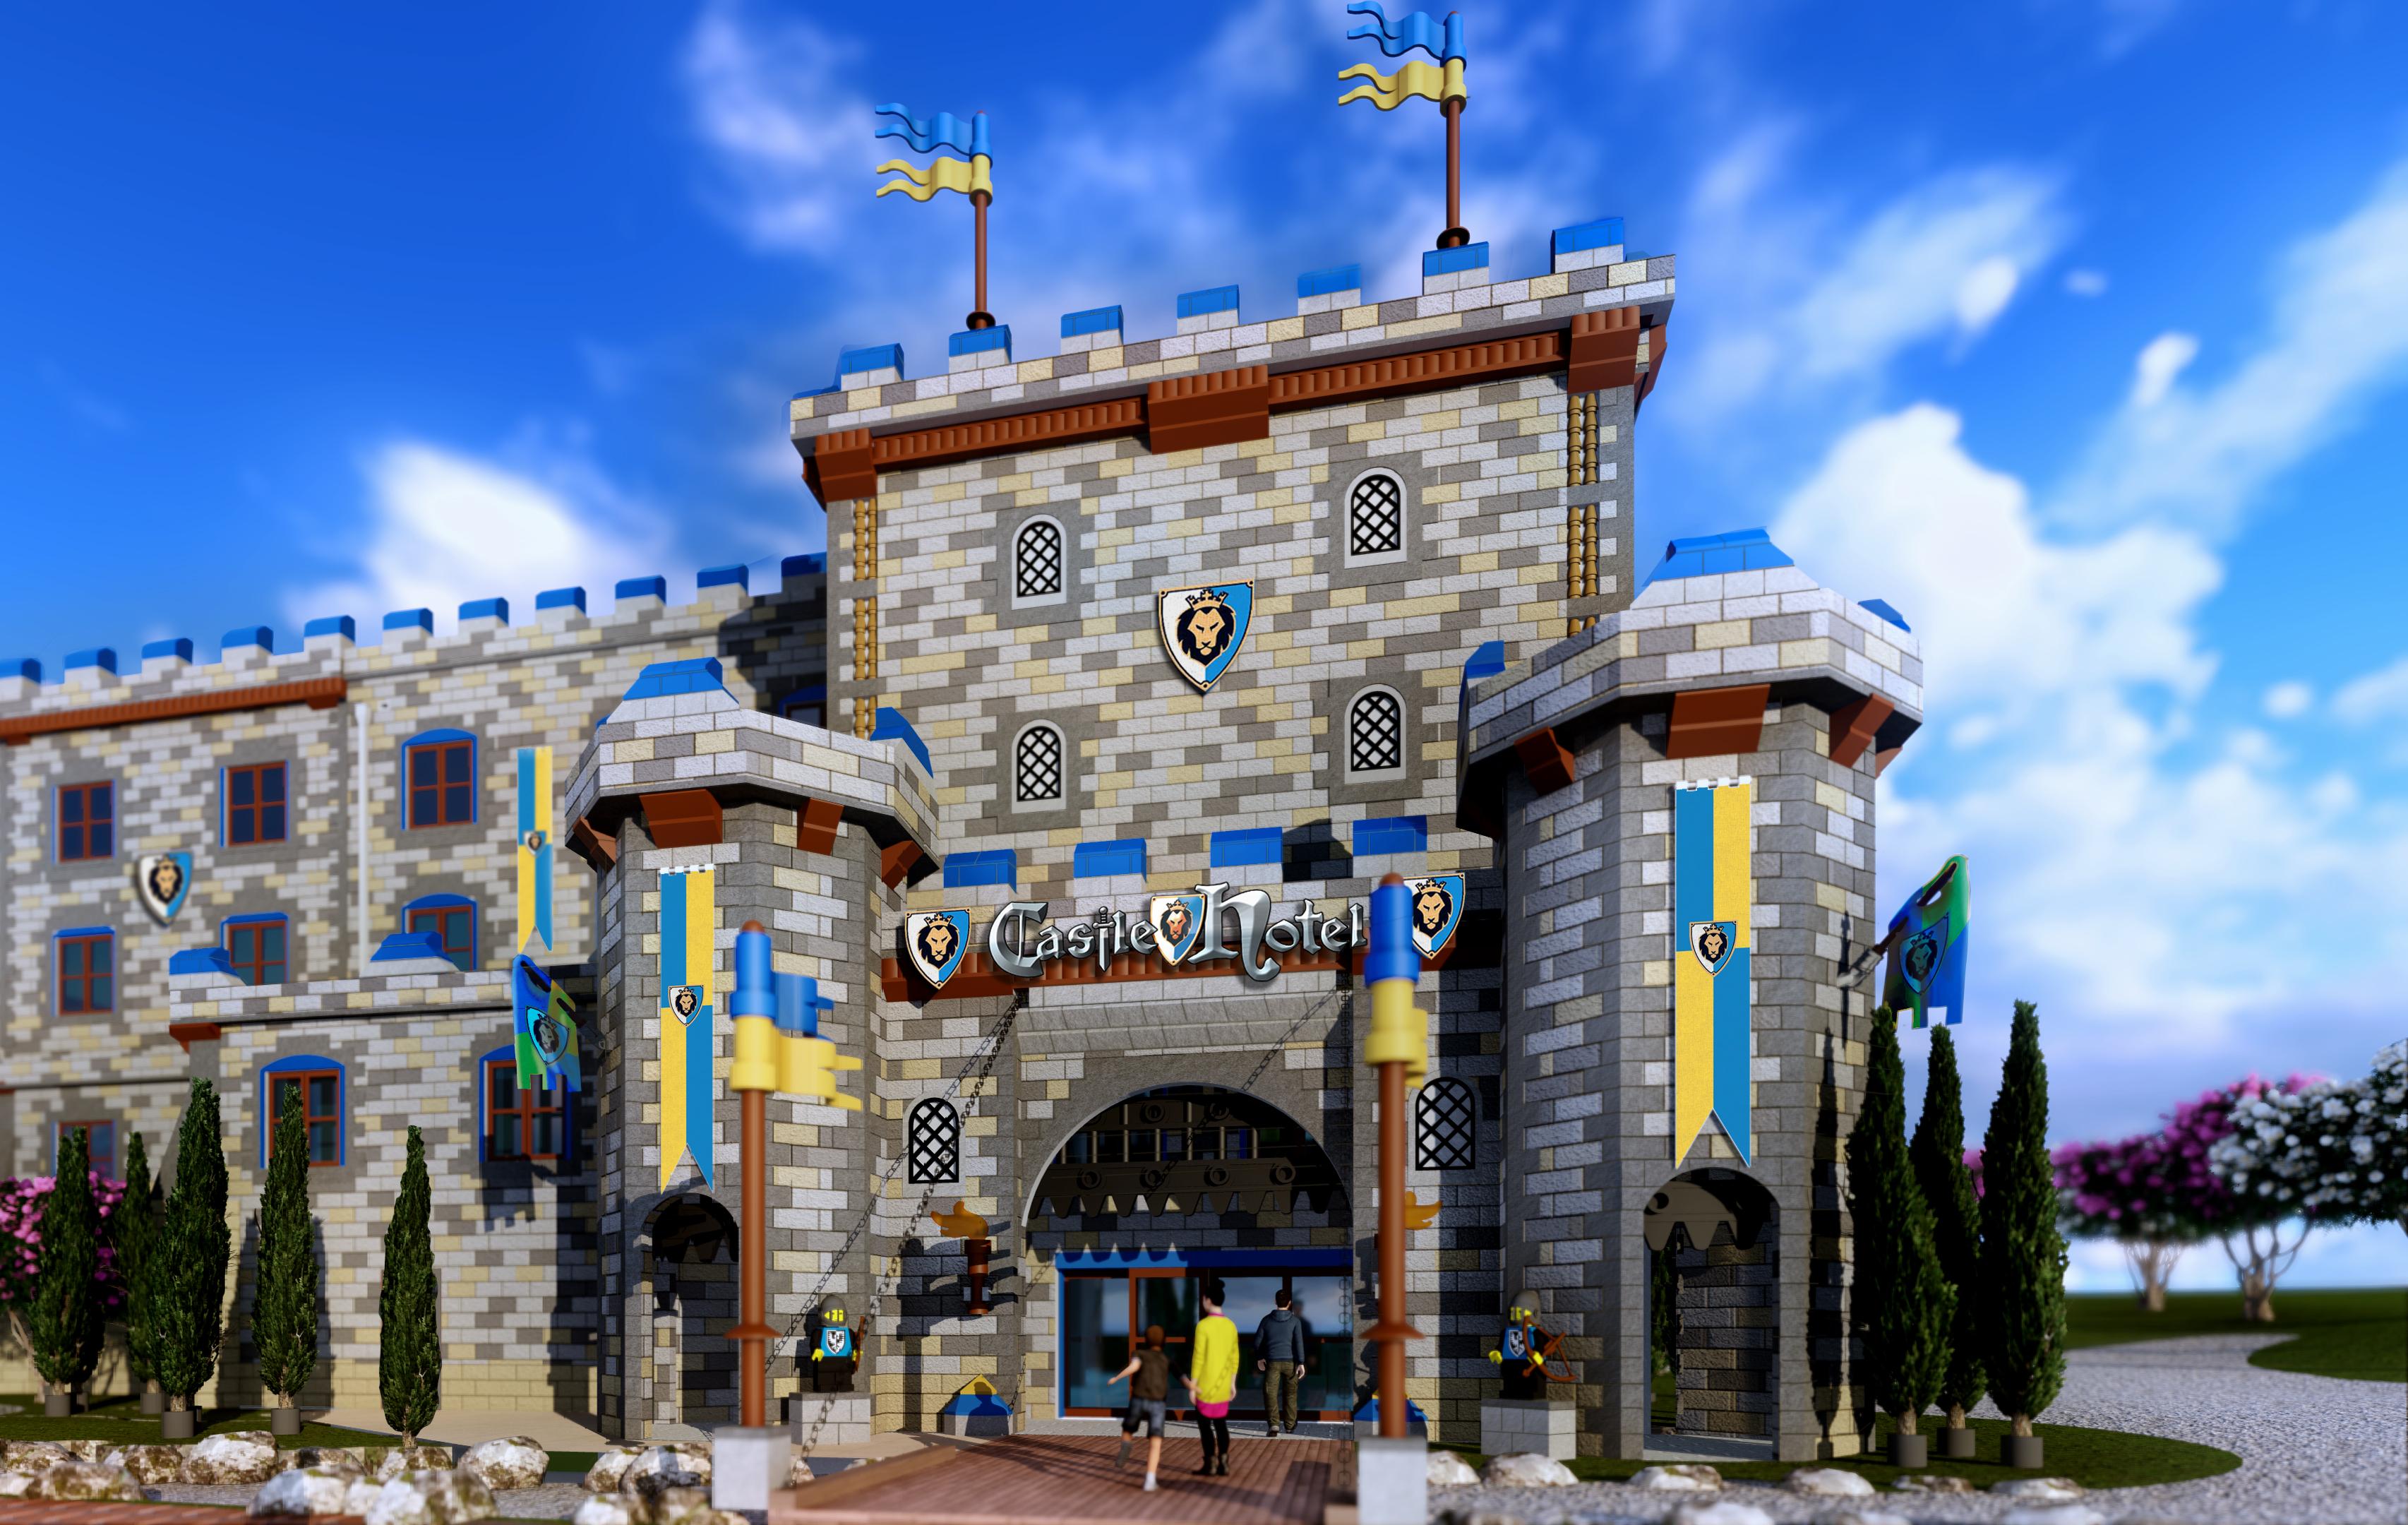 Legoland hotel Carlsbad